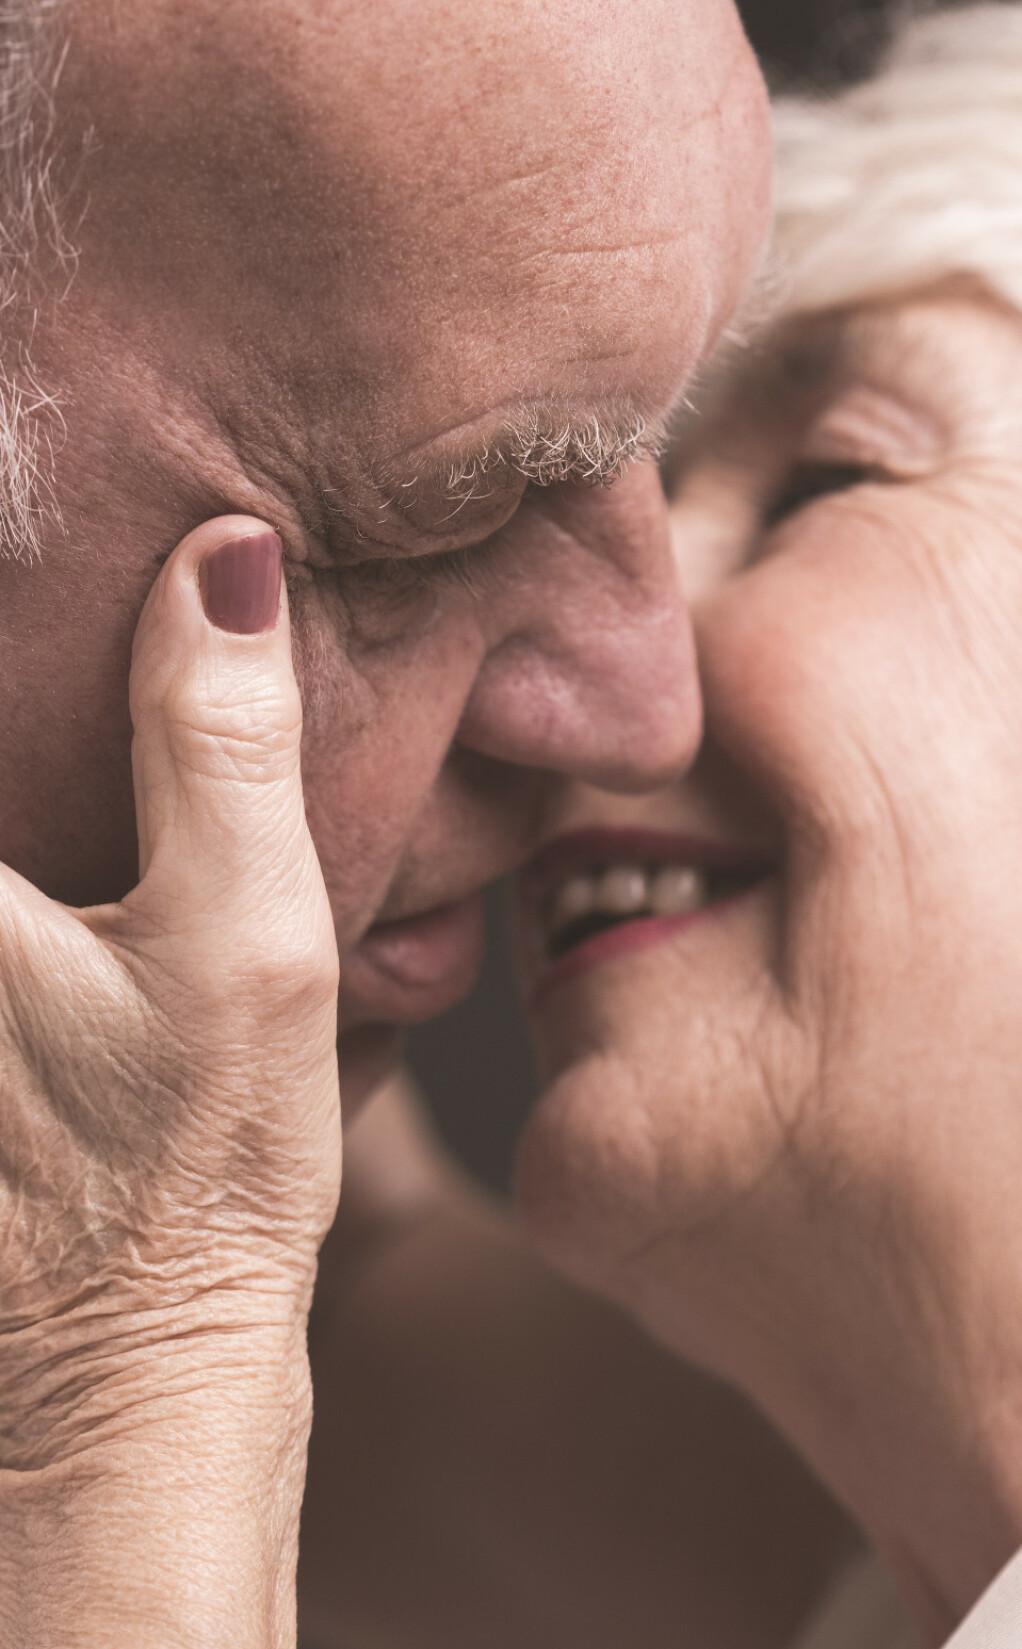 – Vi skal kunne ha god sex til vi er 90 år